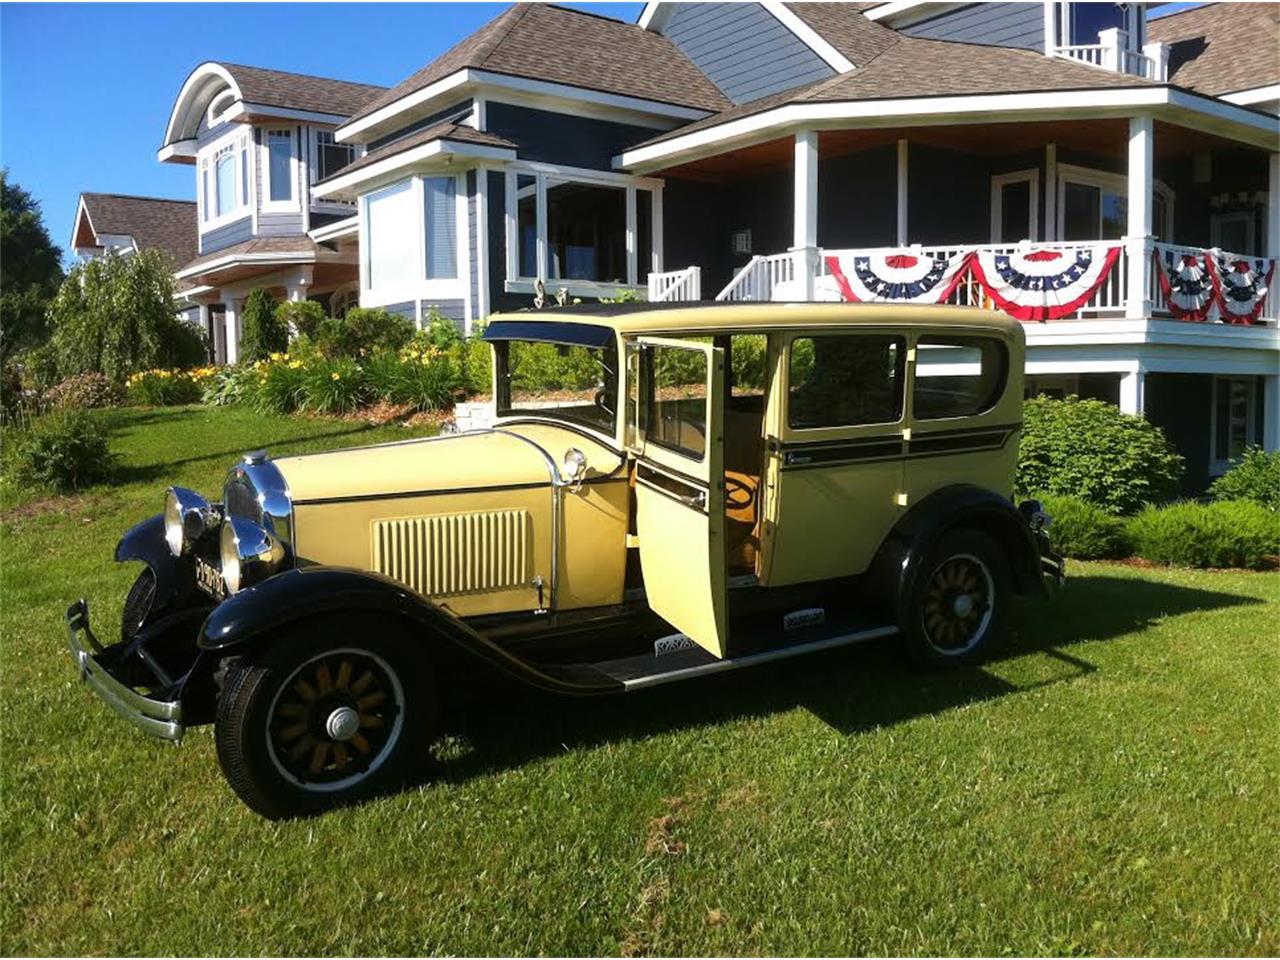 For Sale: 1930 REO Flying Cloud in Boyne City, Michigan